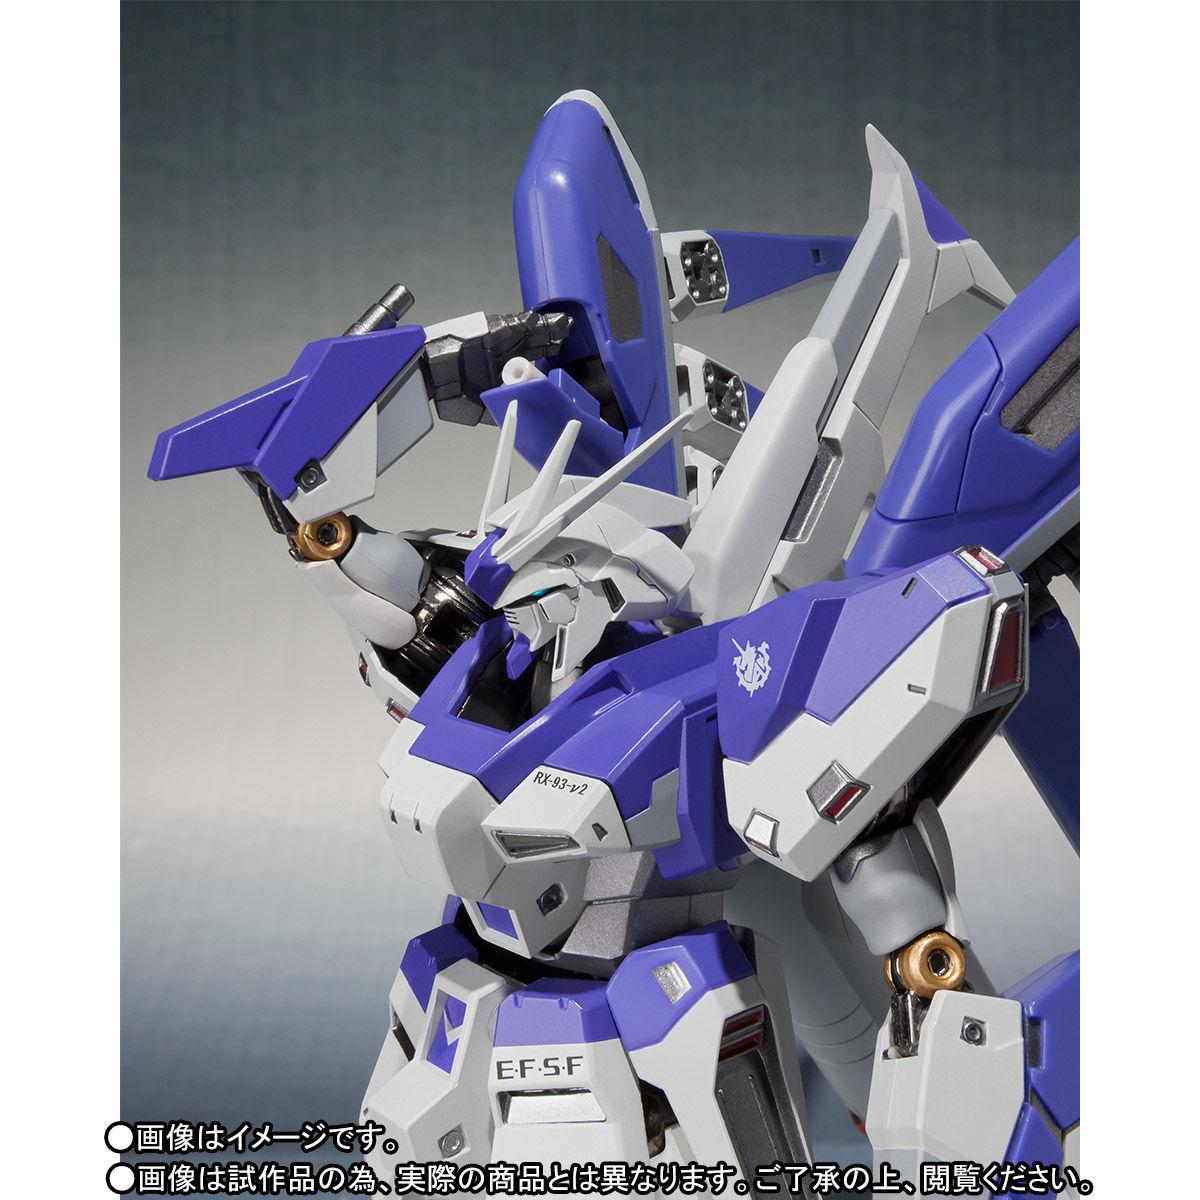 METAL ROBOT魂『Hi-νガンダム』逆襲のシャア 可動フィギュア-005